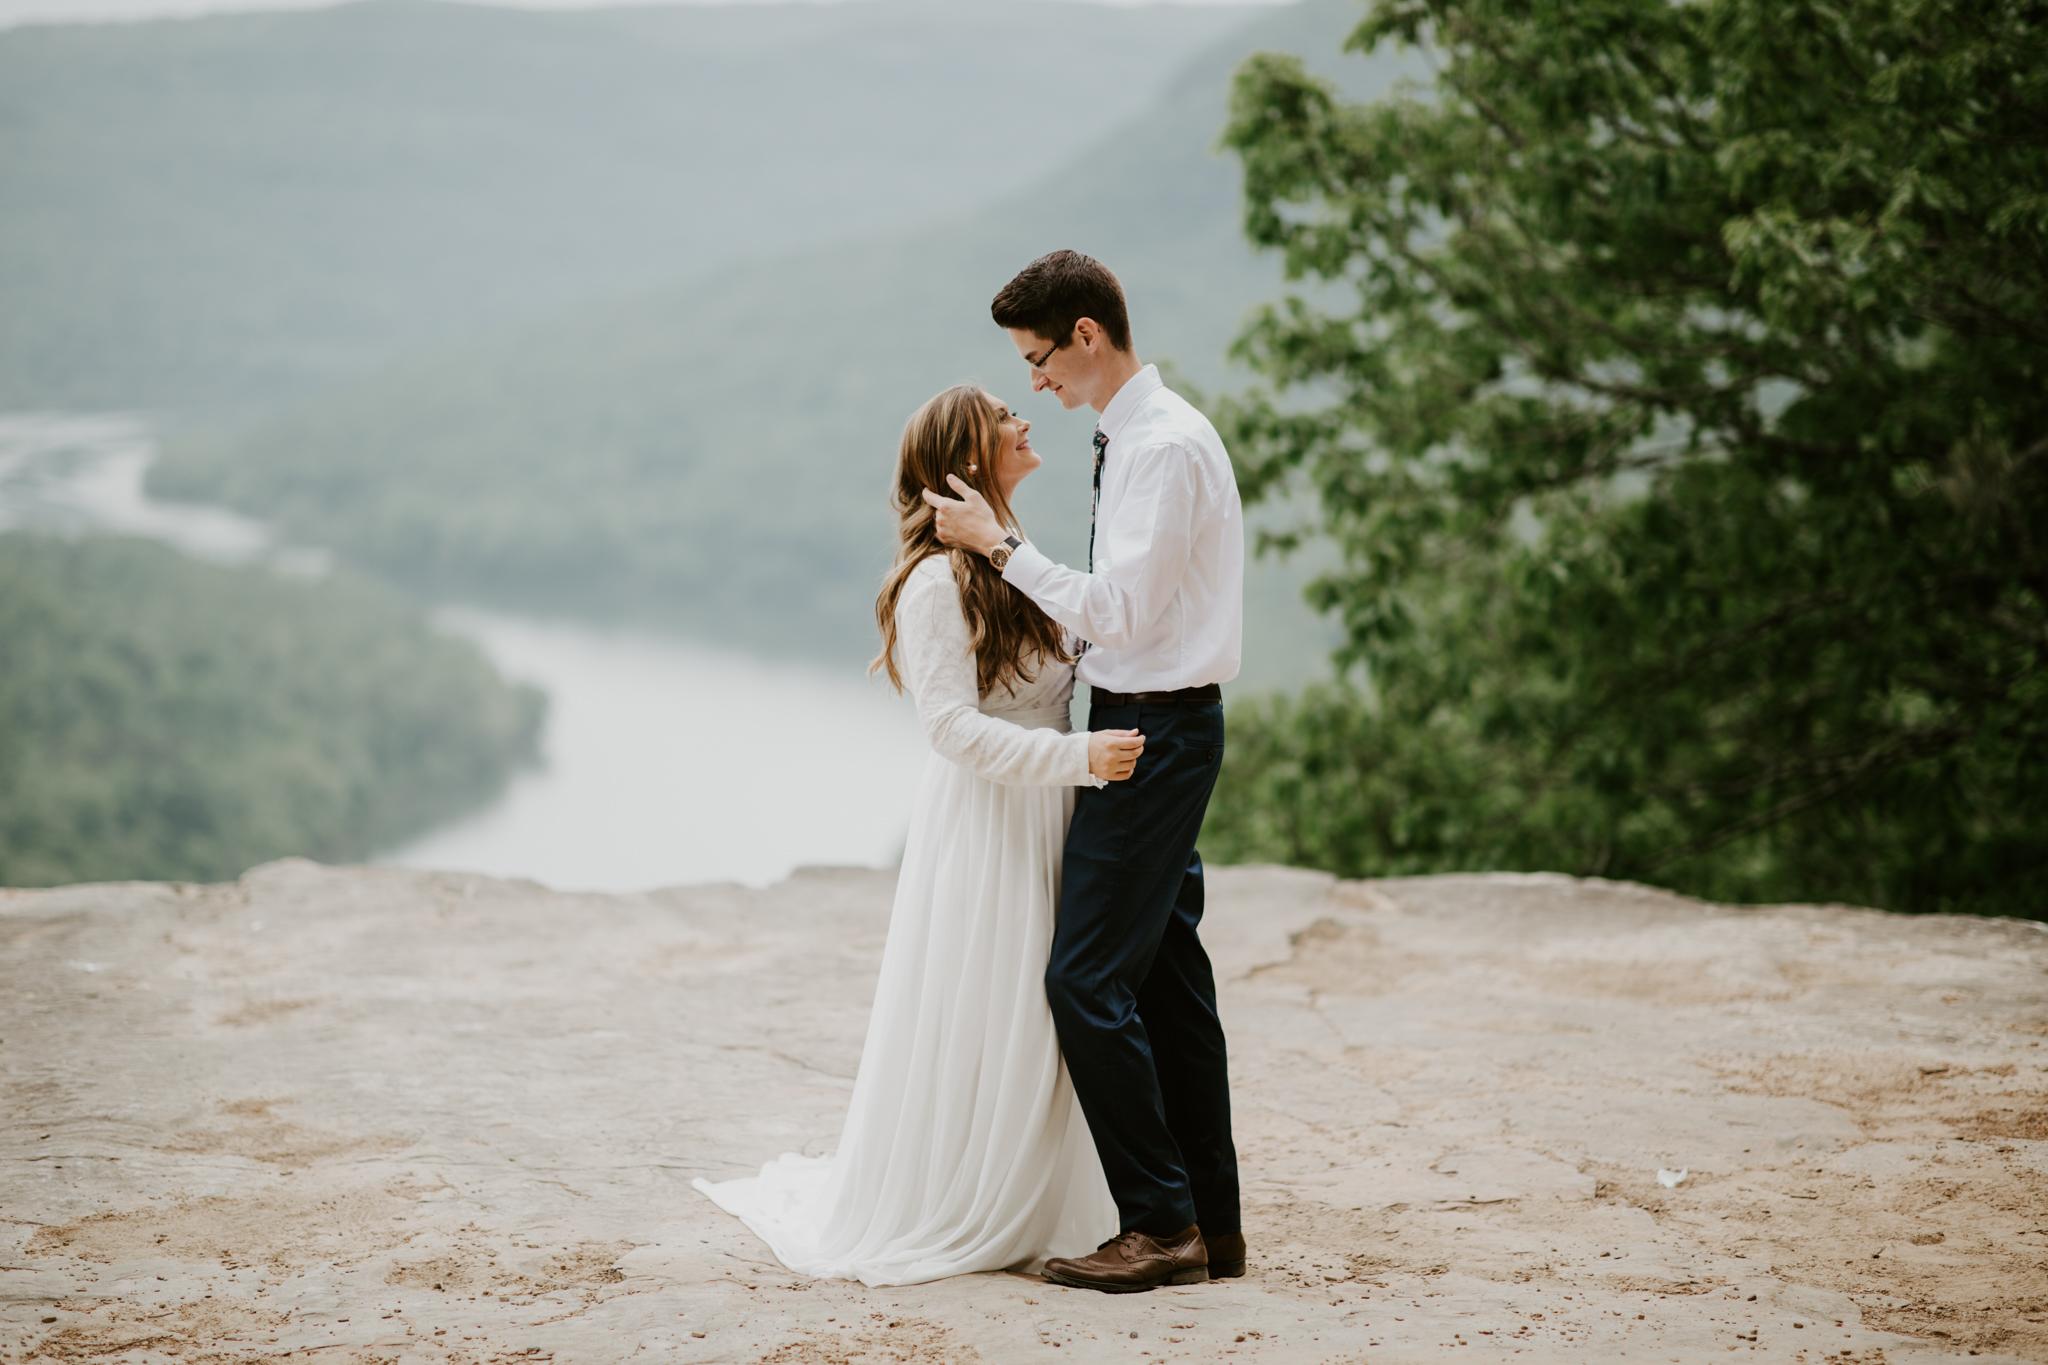 Lacey-Joe-Chattanooga-Nashville-Tennessee-Wedding-Elopement-Photographer-160.jpg